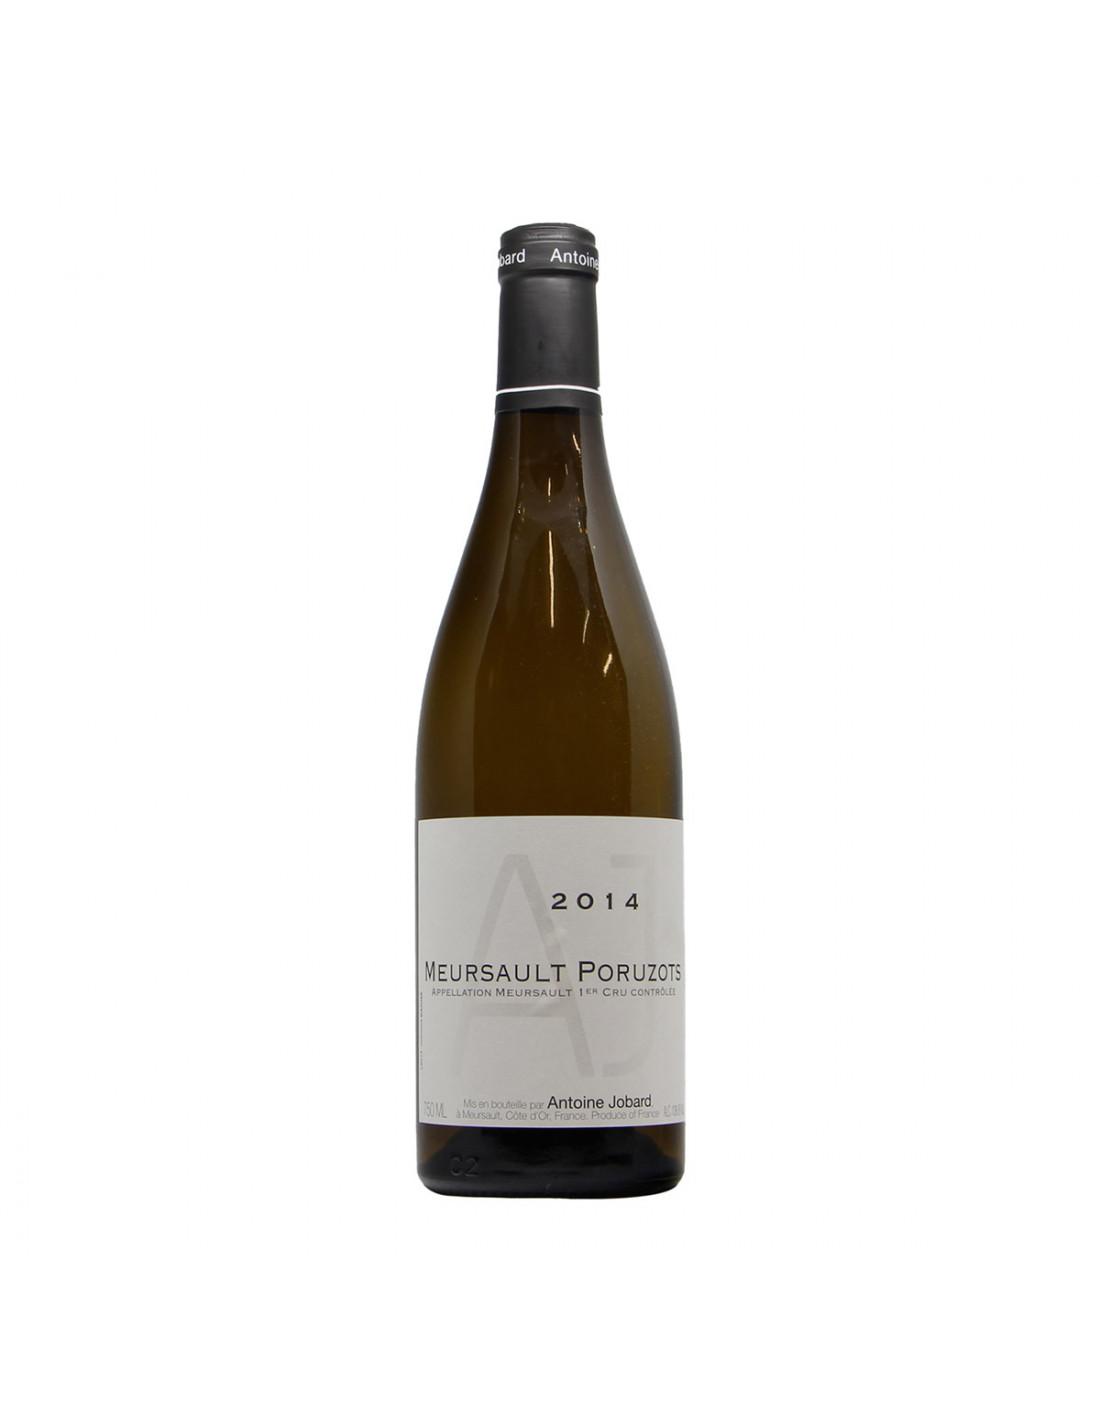 MEURSAULT PORUZOTS 1ER CRU 2014 ANTOINE JOBARD Grandi Bottiglie